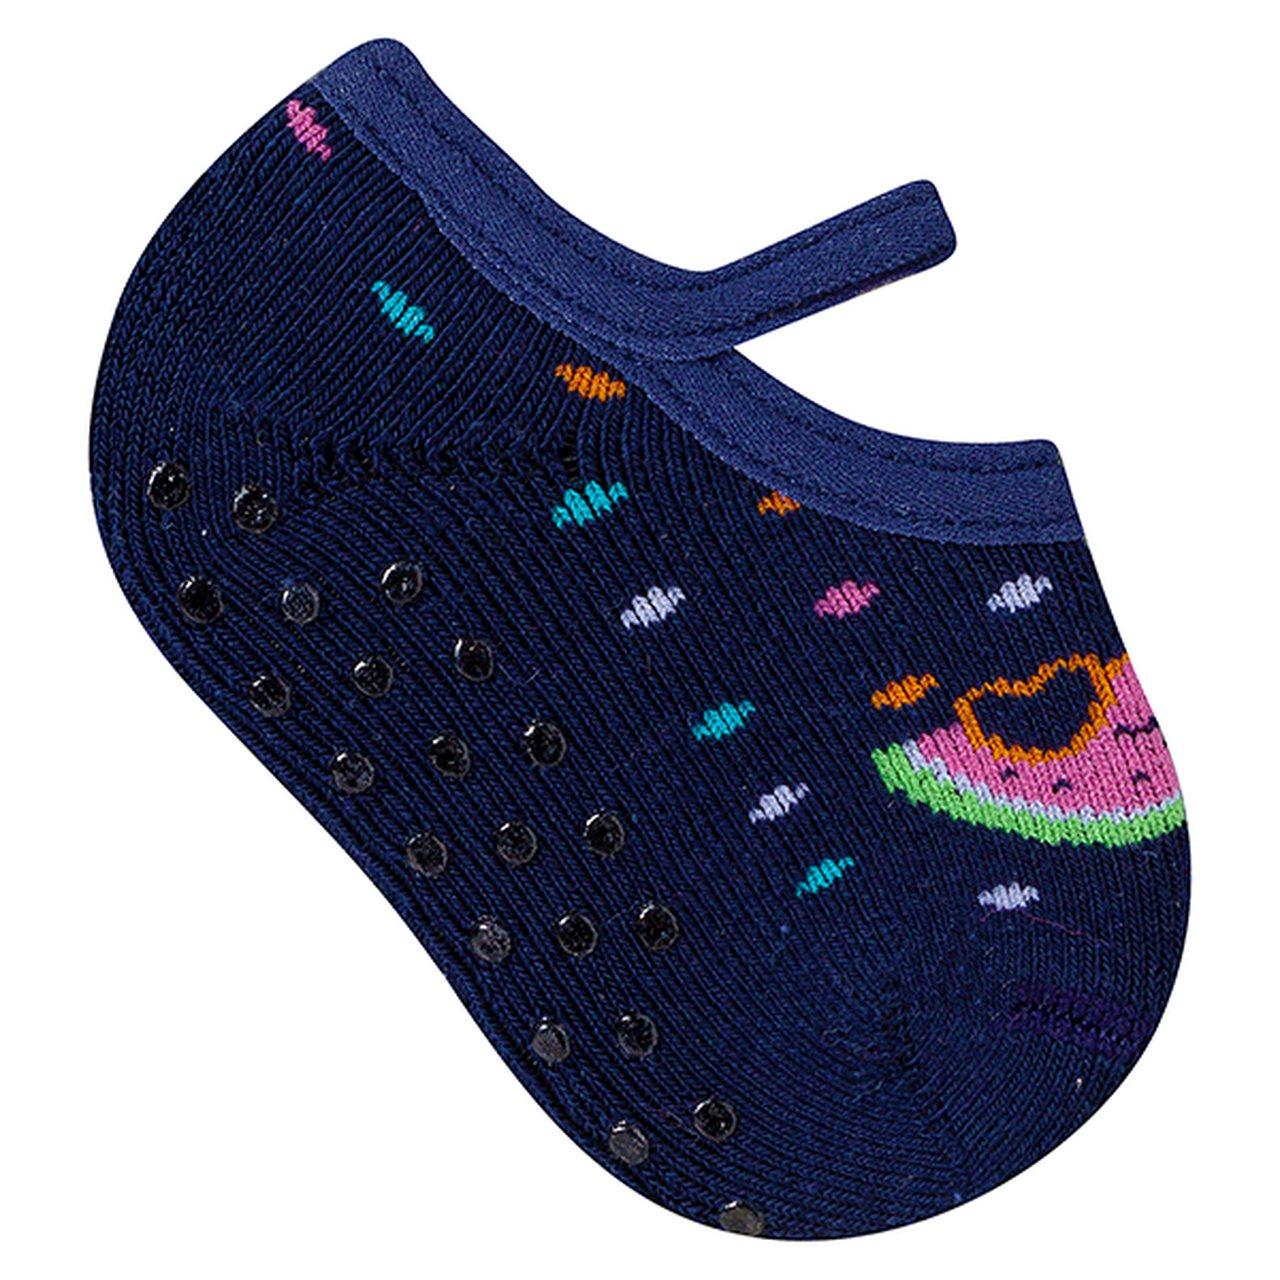 Meia sapatilha antiderrapante bebê coloridas